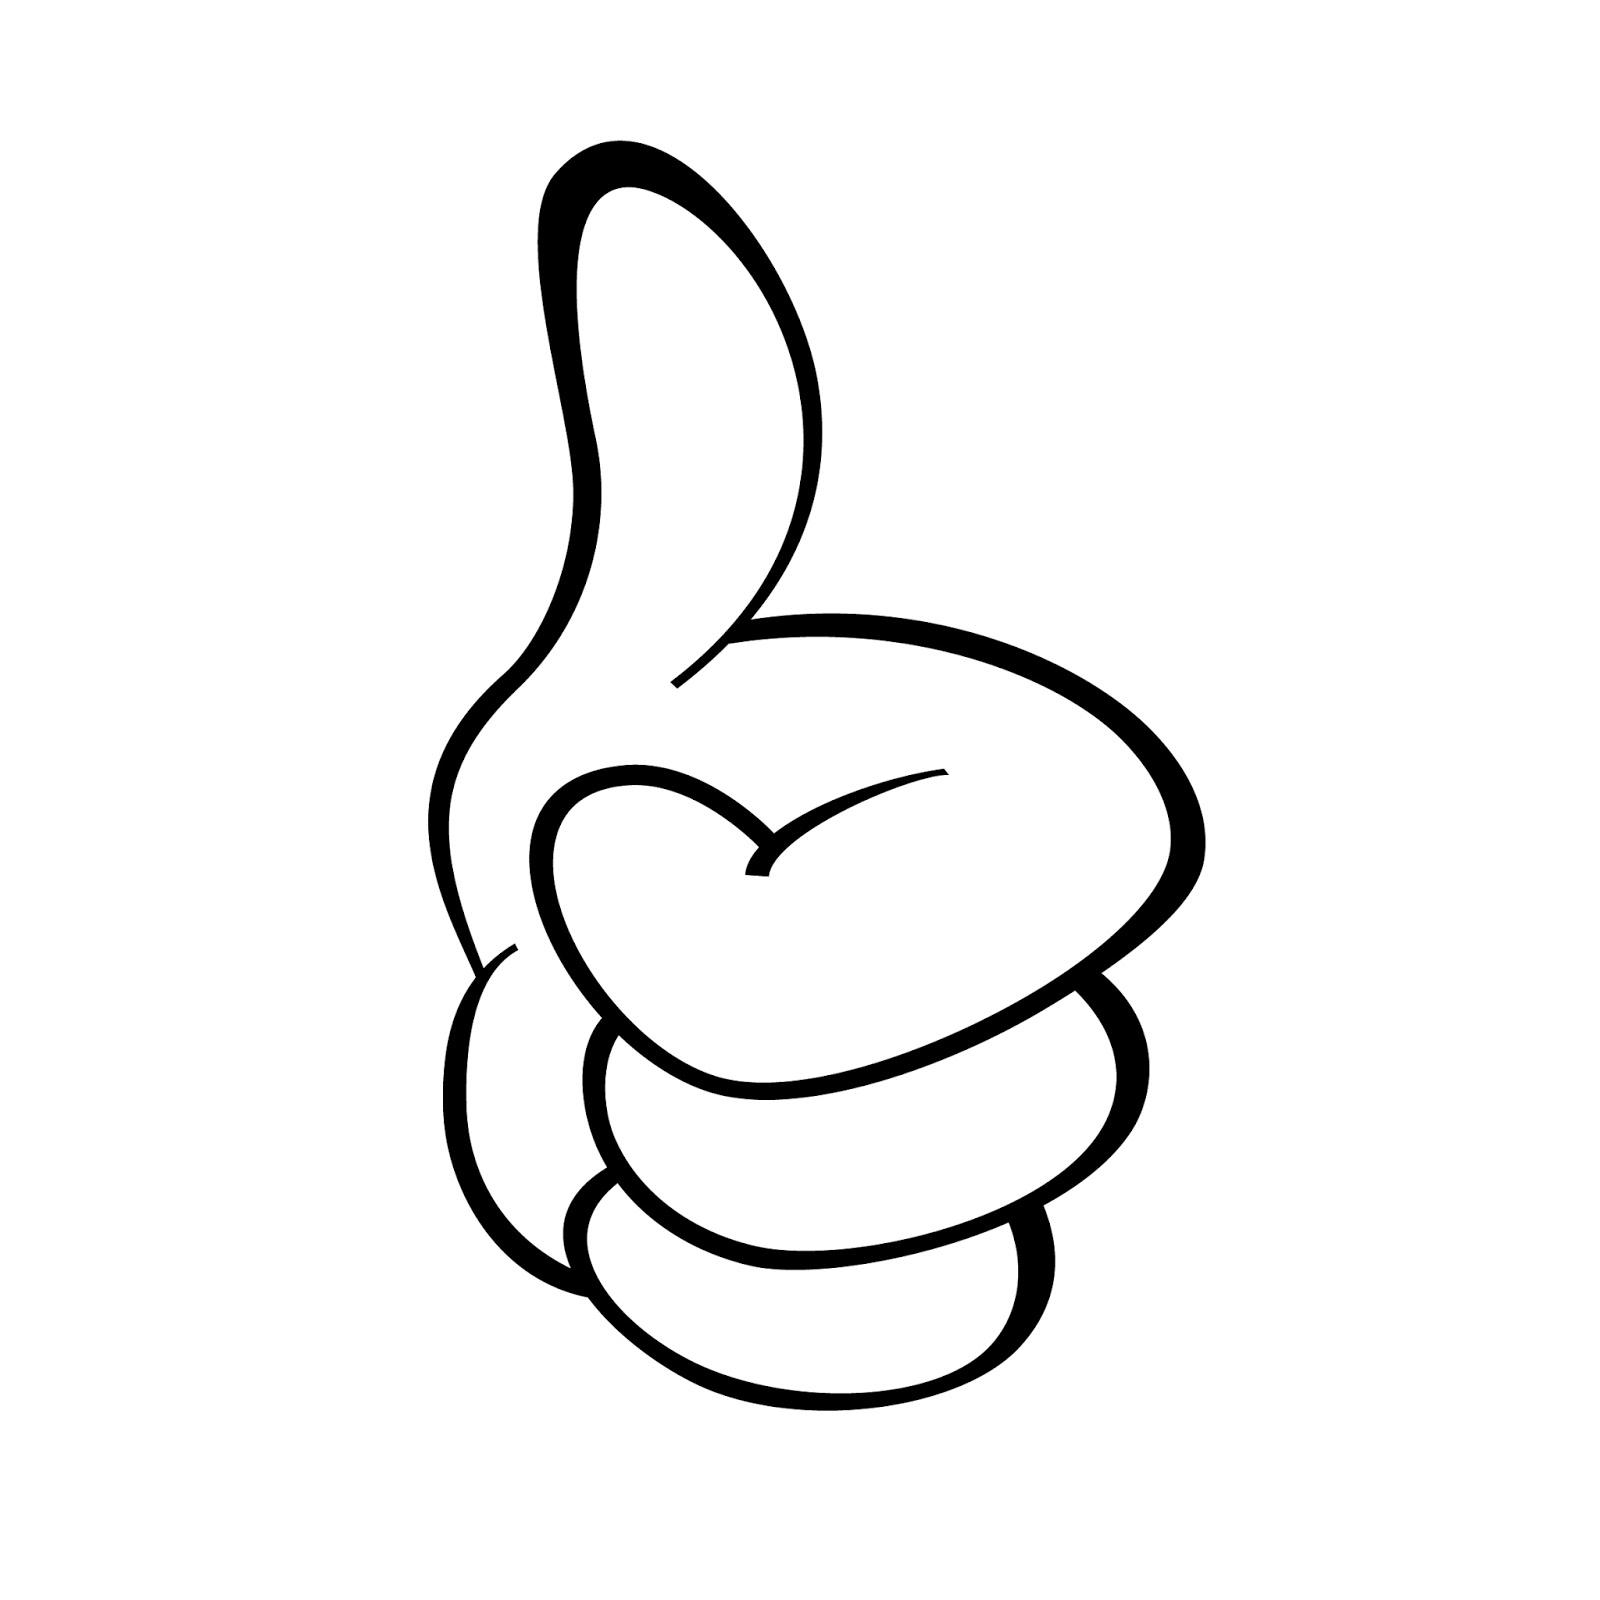 Thumbs up emoji clipart jpg black and white stock Thumbs up clip art black and white - ClipartFest jpg black and white stock